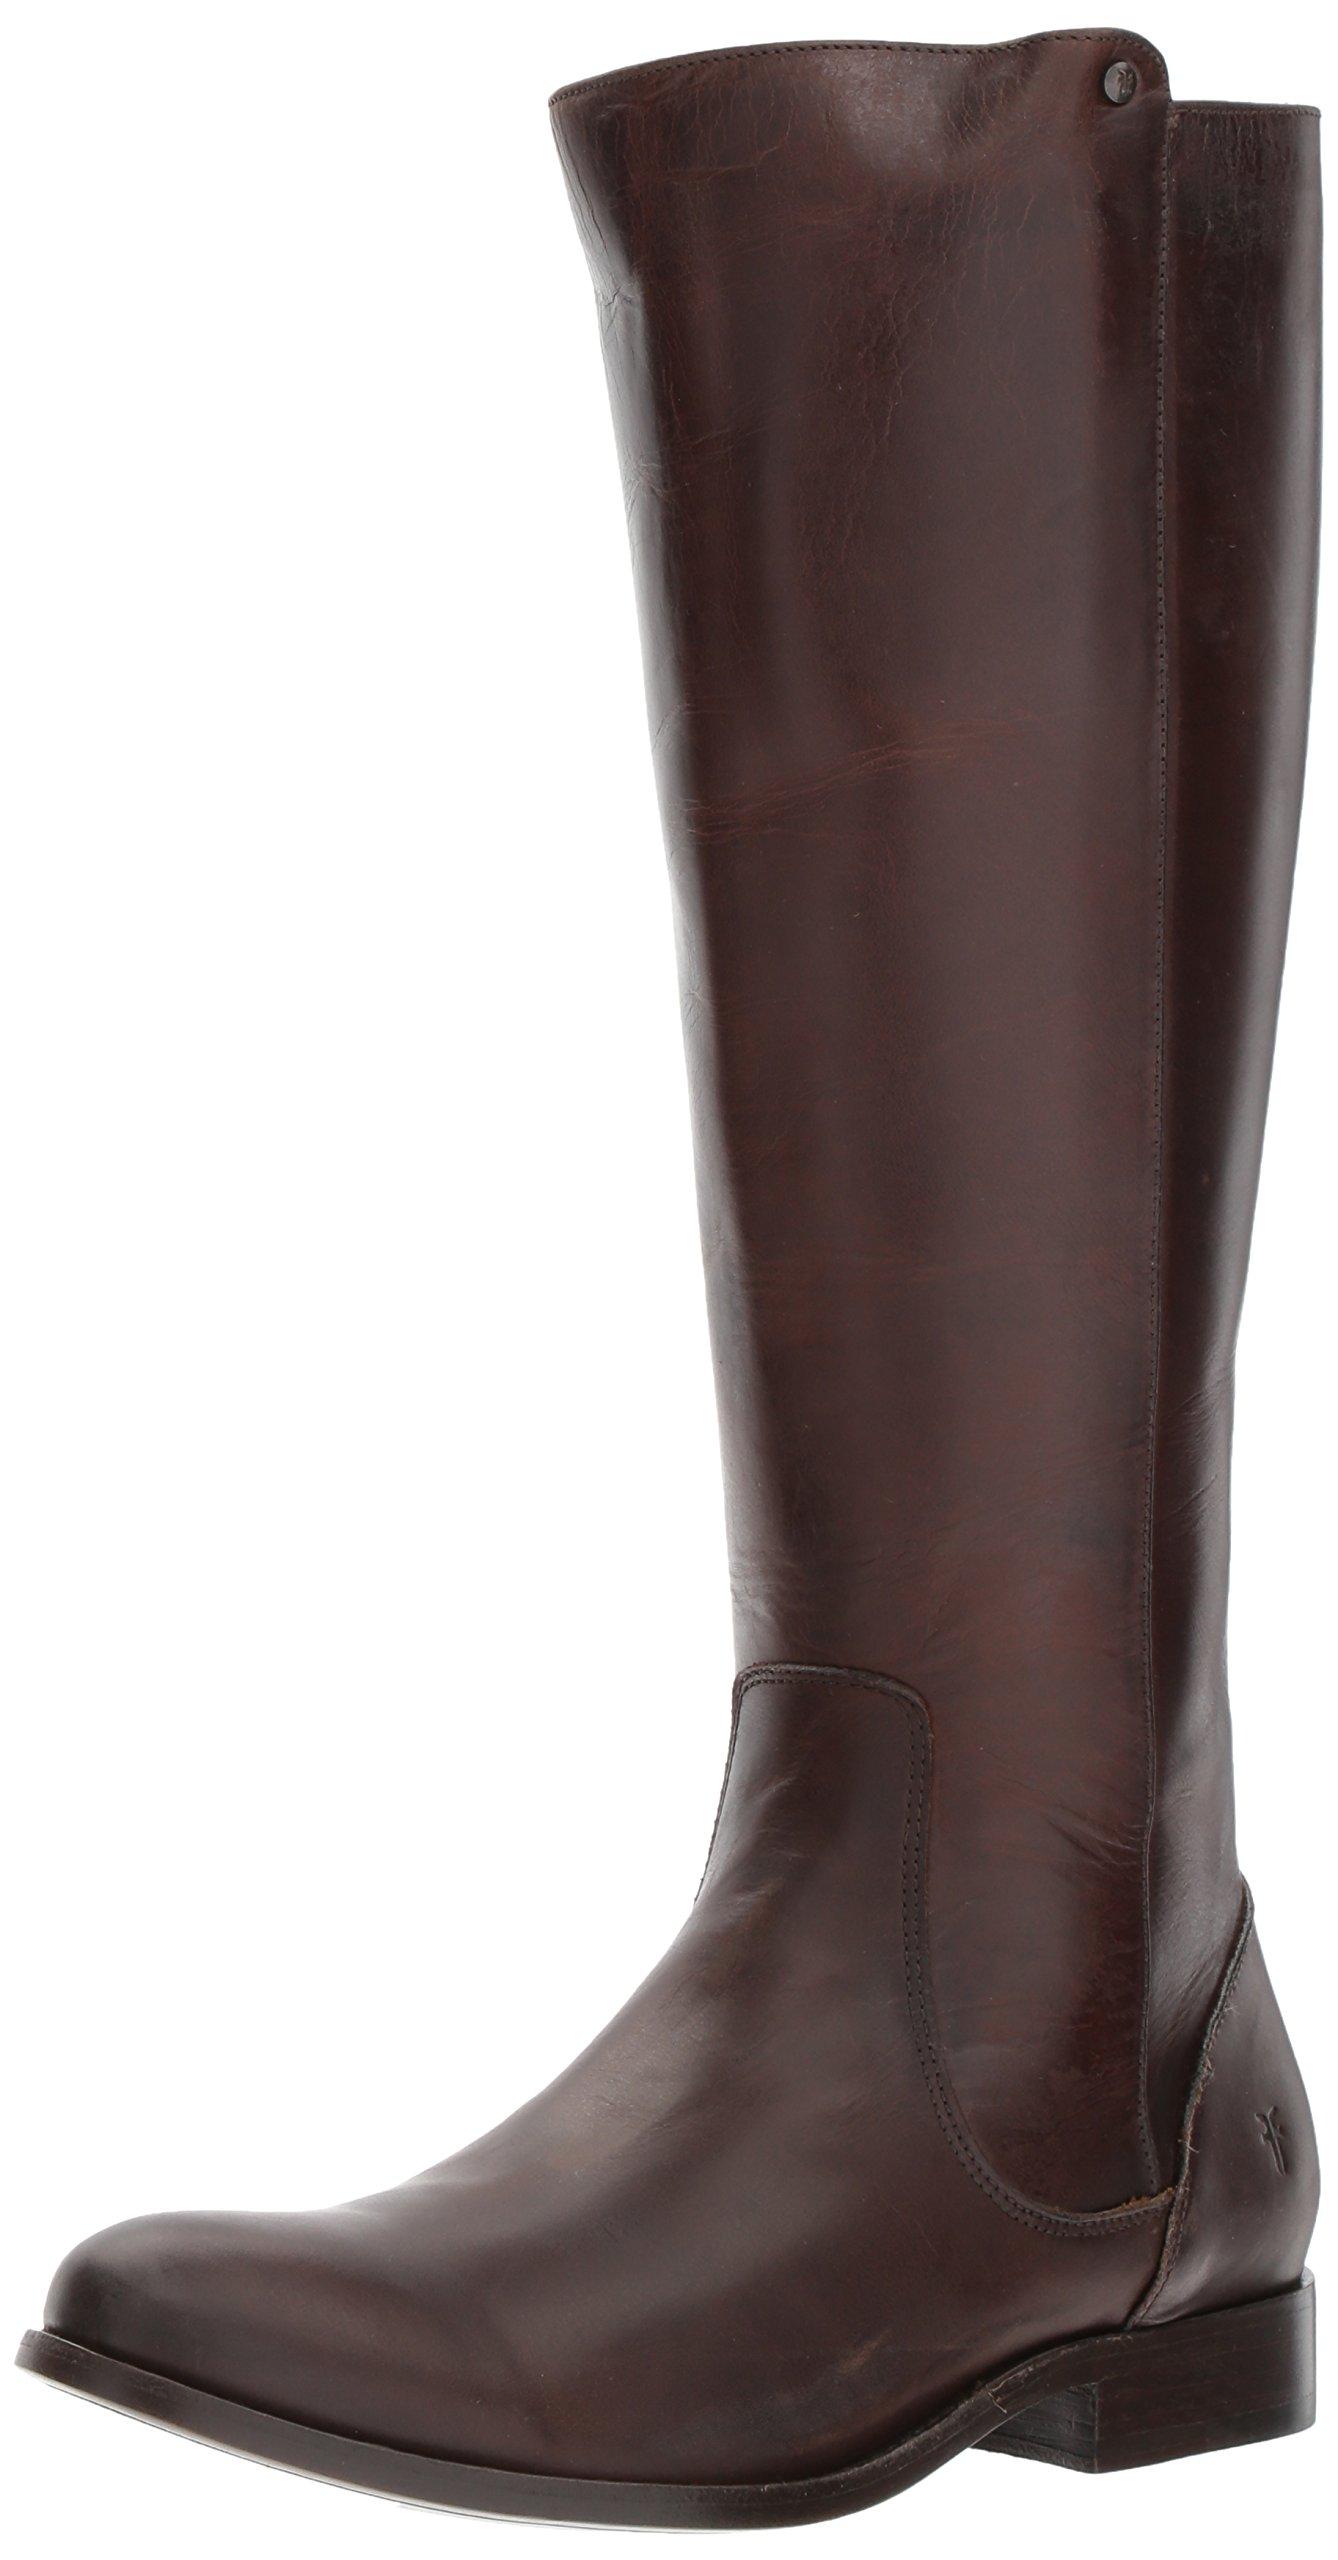 FRYE Women's Melissa Stud Back Zip Riding Boot, Chocolate, 8.5 M US